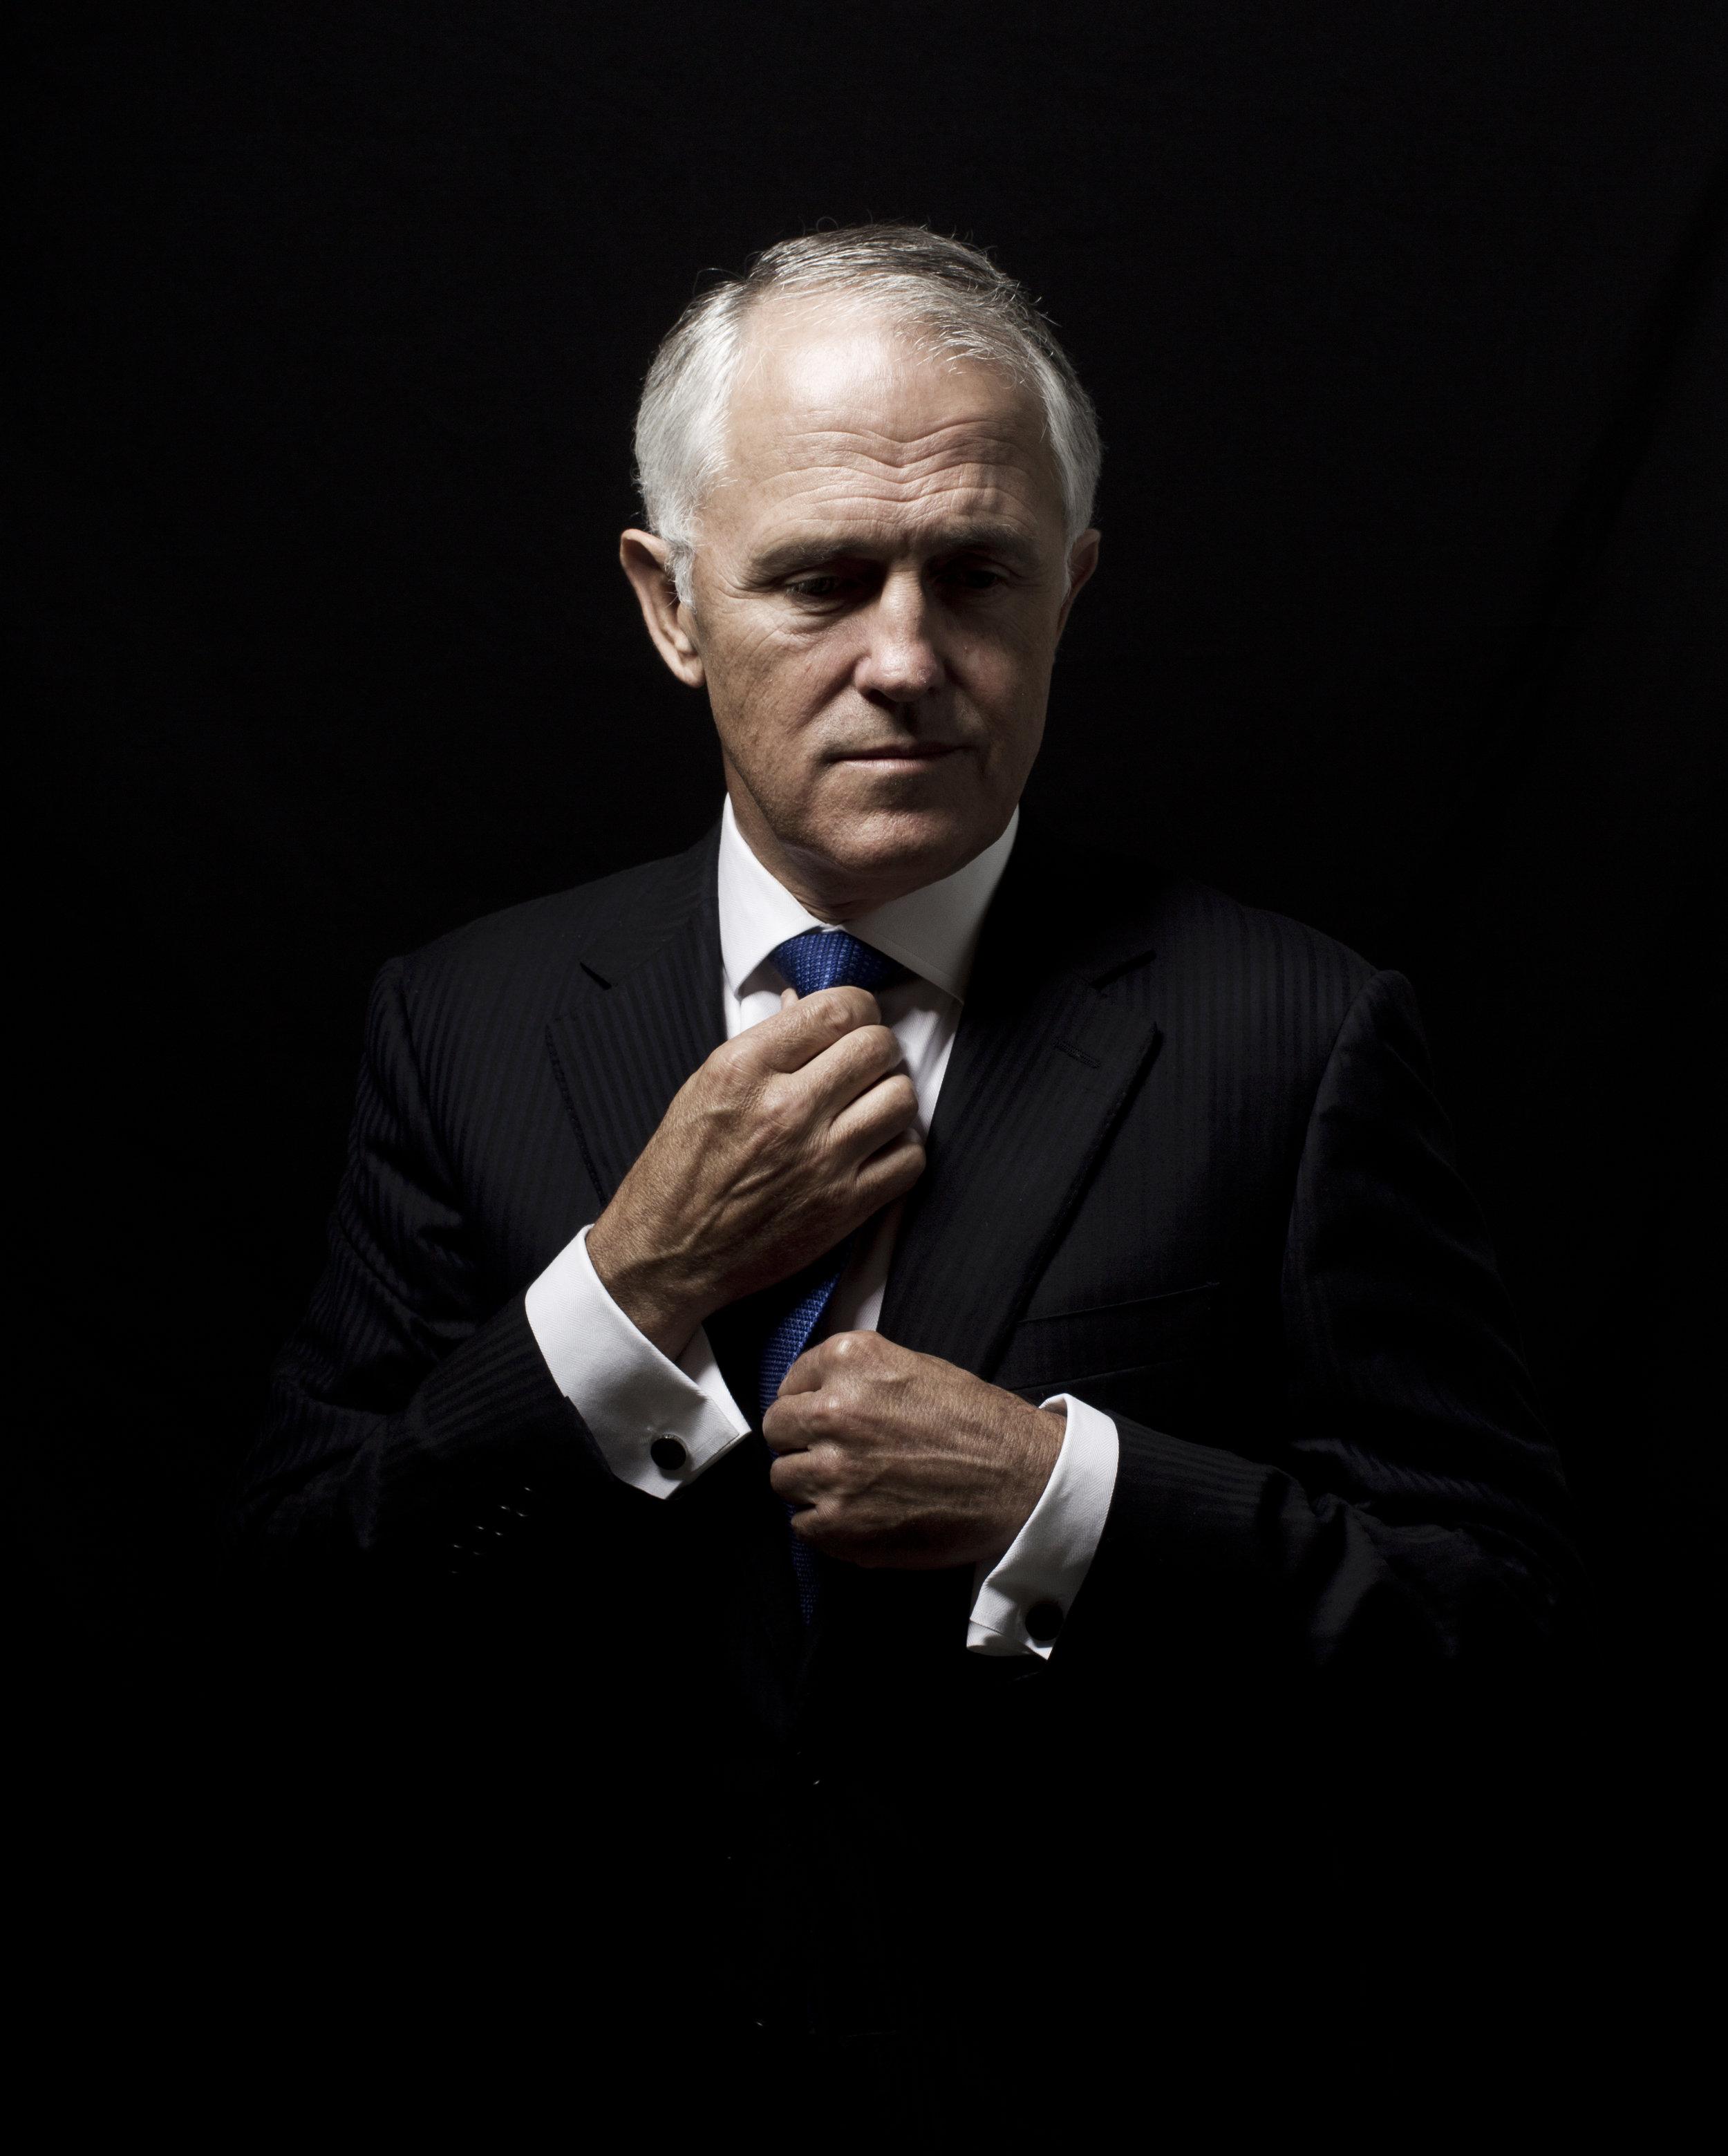 Prime Minister - Malcolm Turnbull